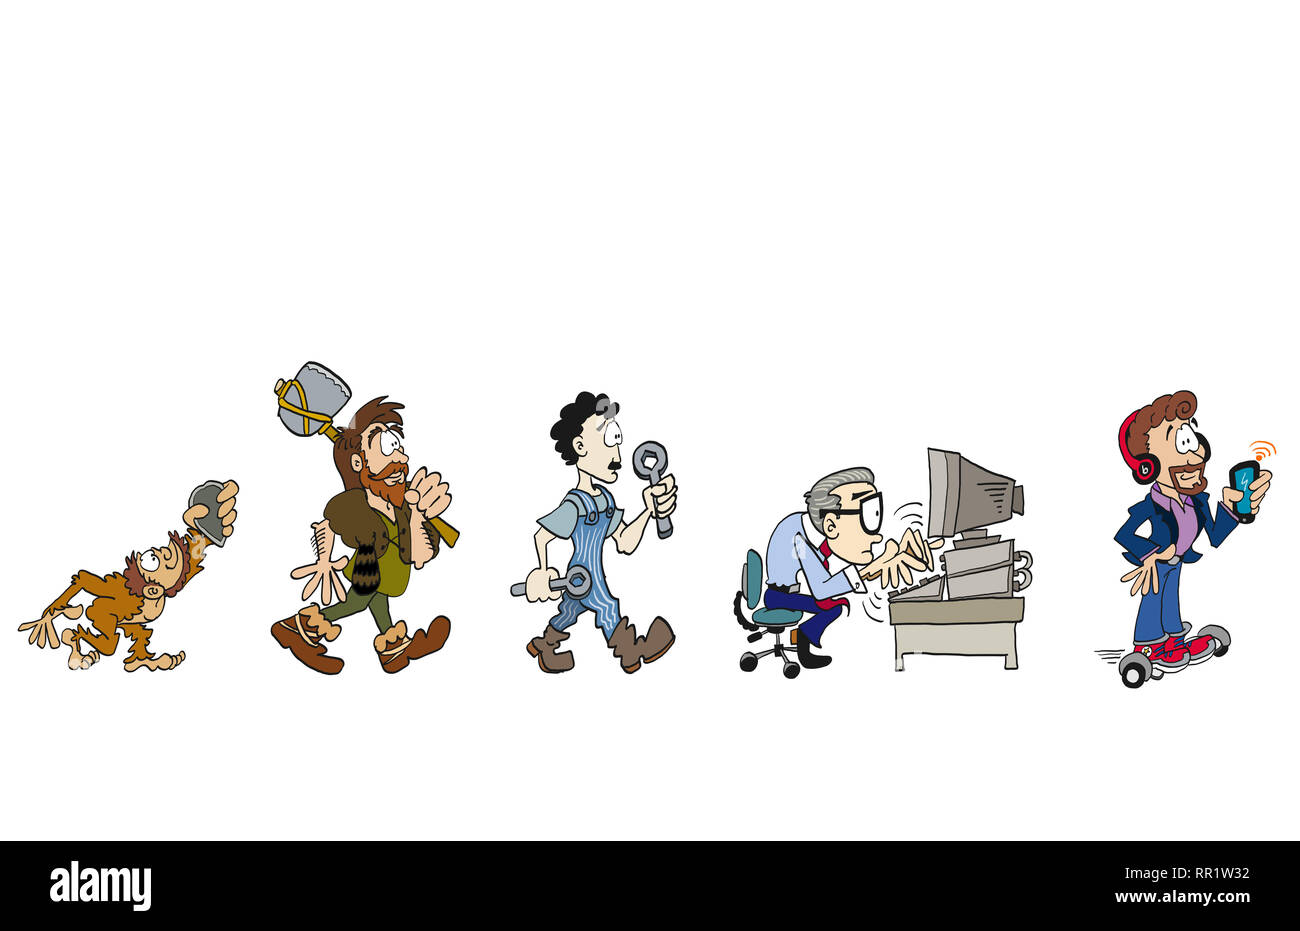 History evolution of work - Stock Image